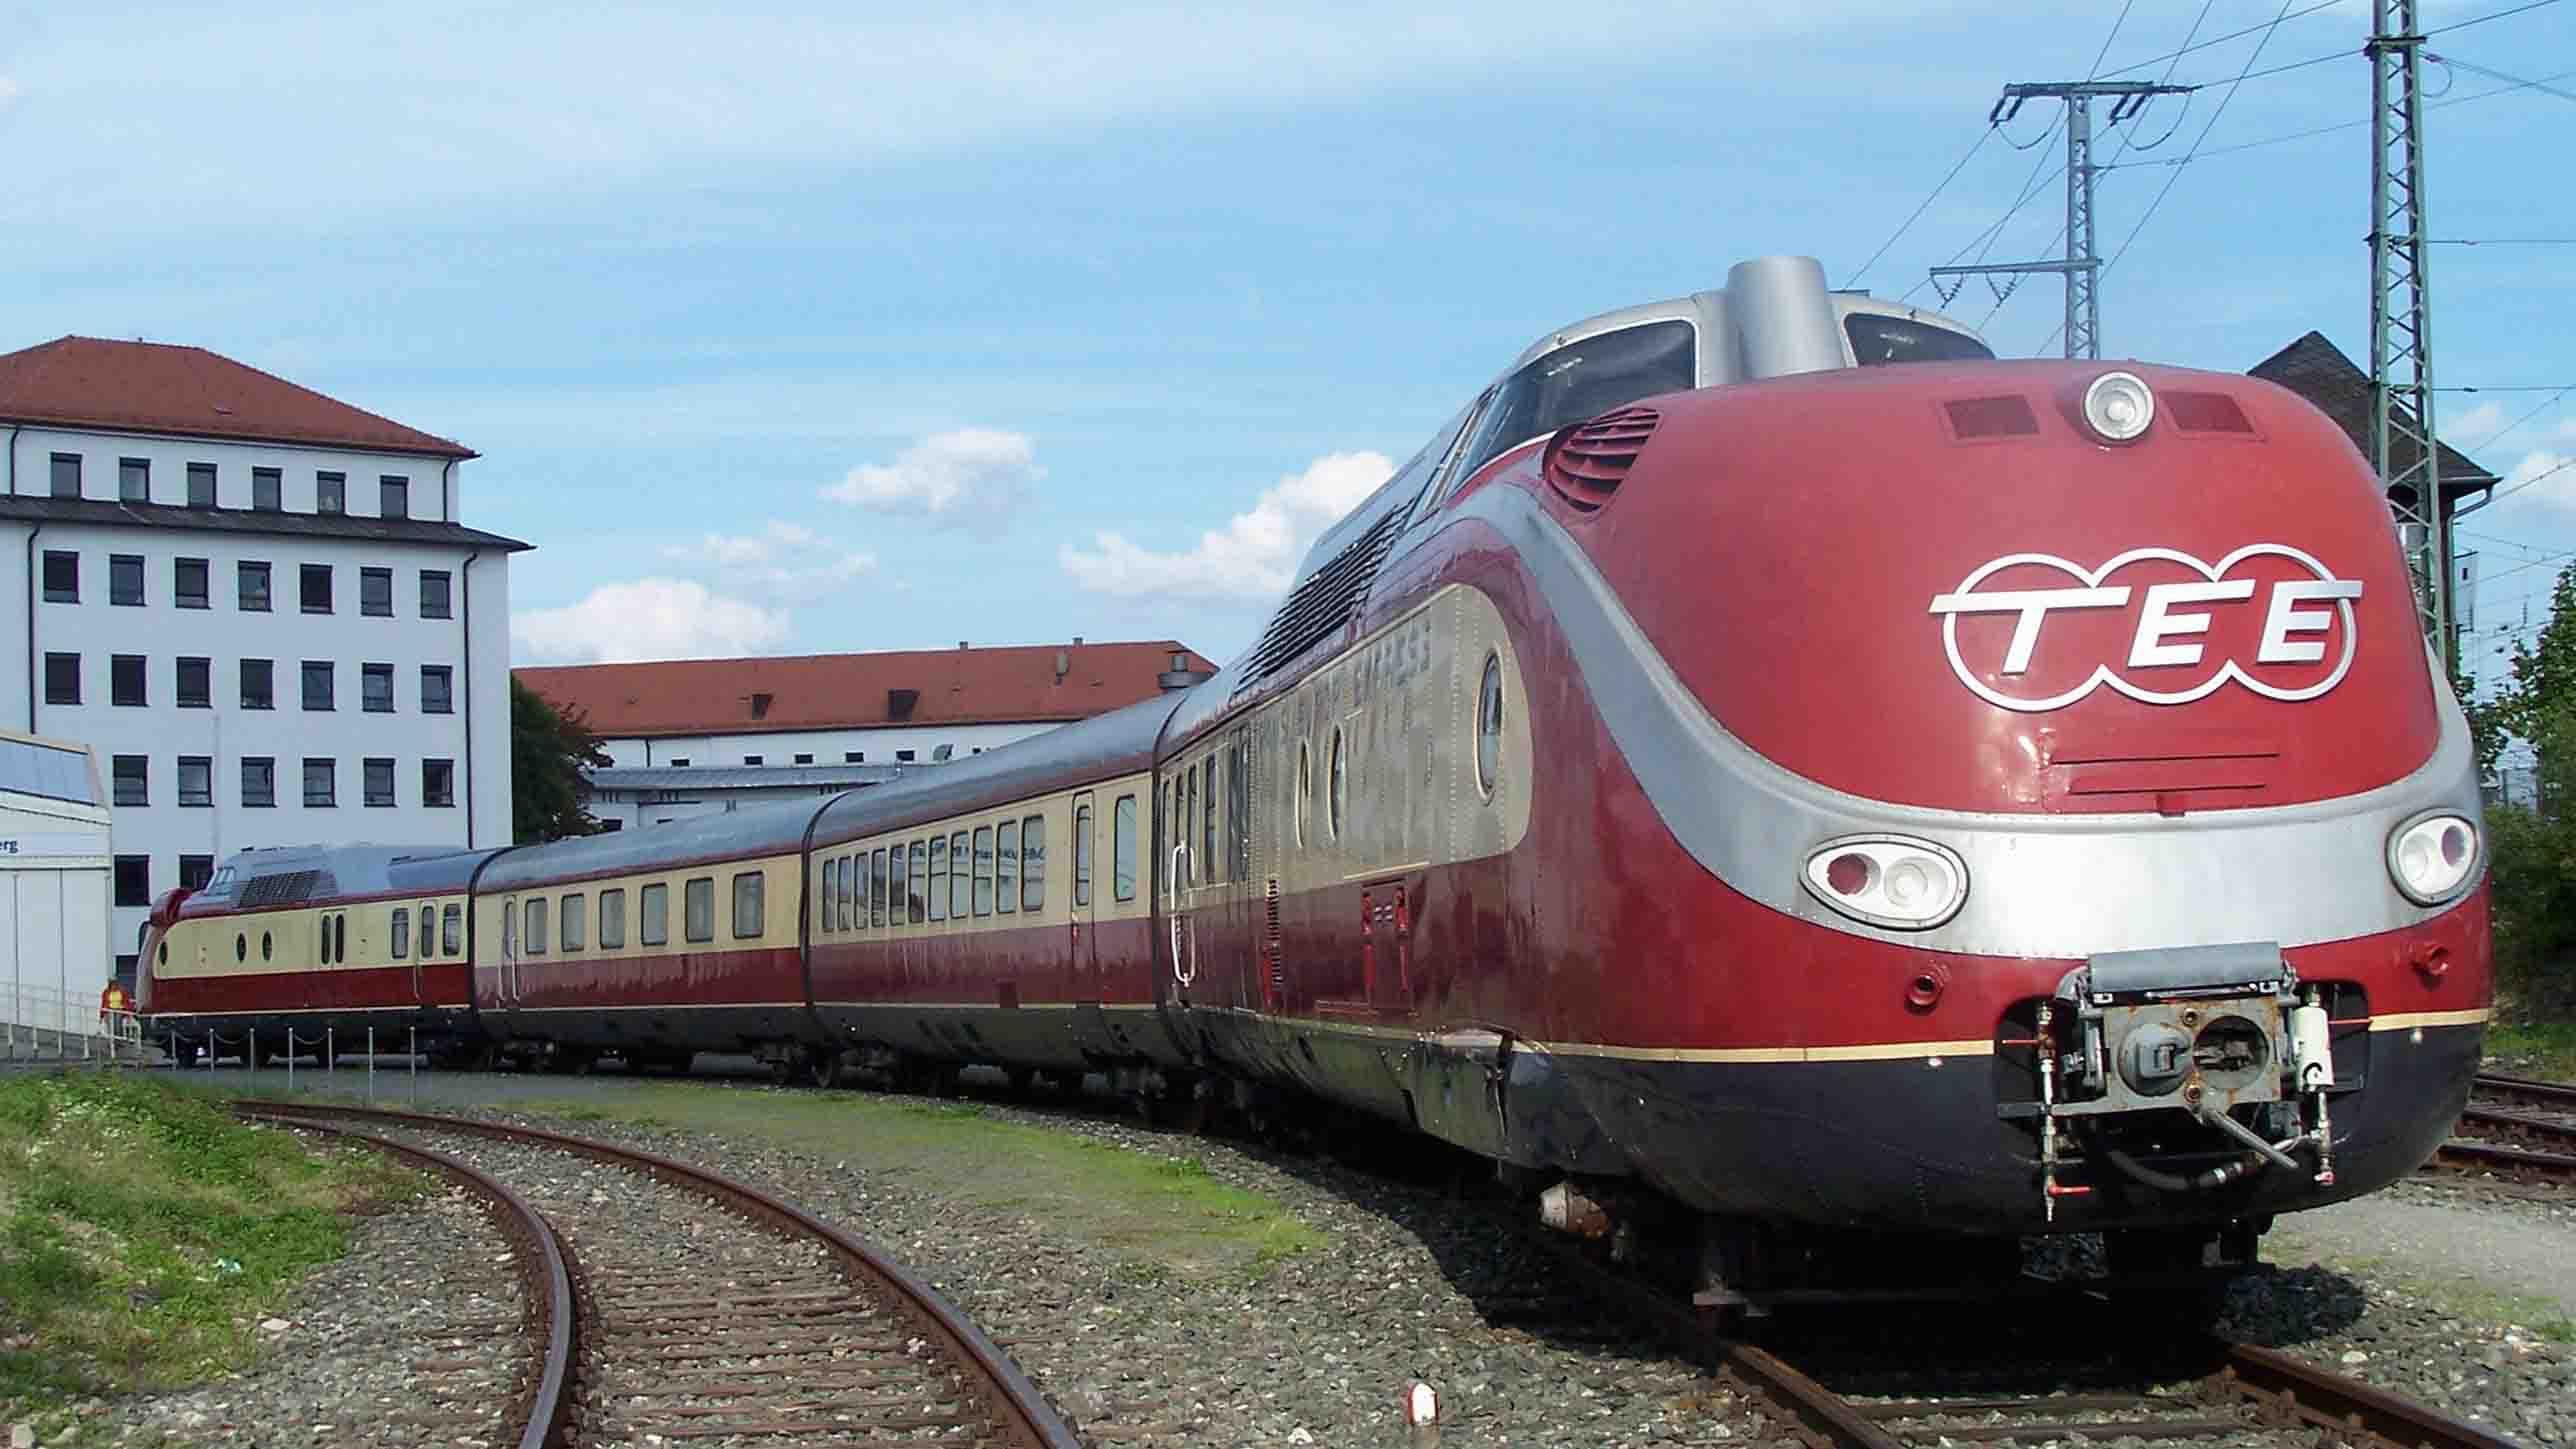 601_Verkehrsmuseum_Nuernberg_11092010_complete_train